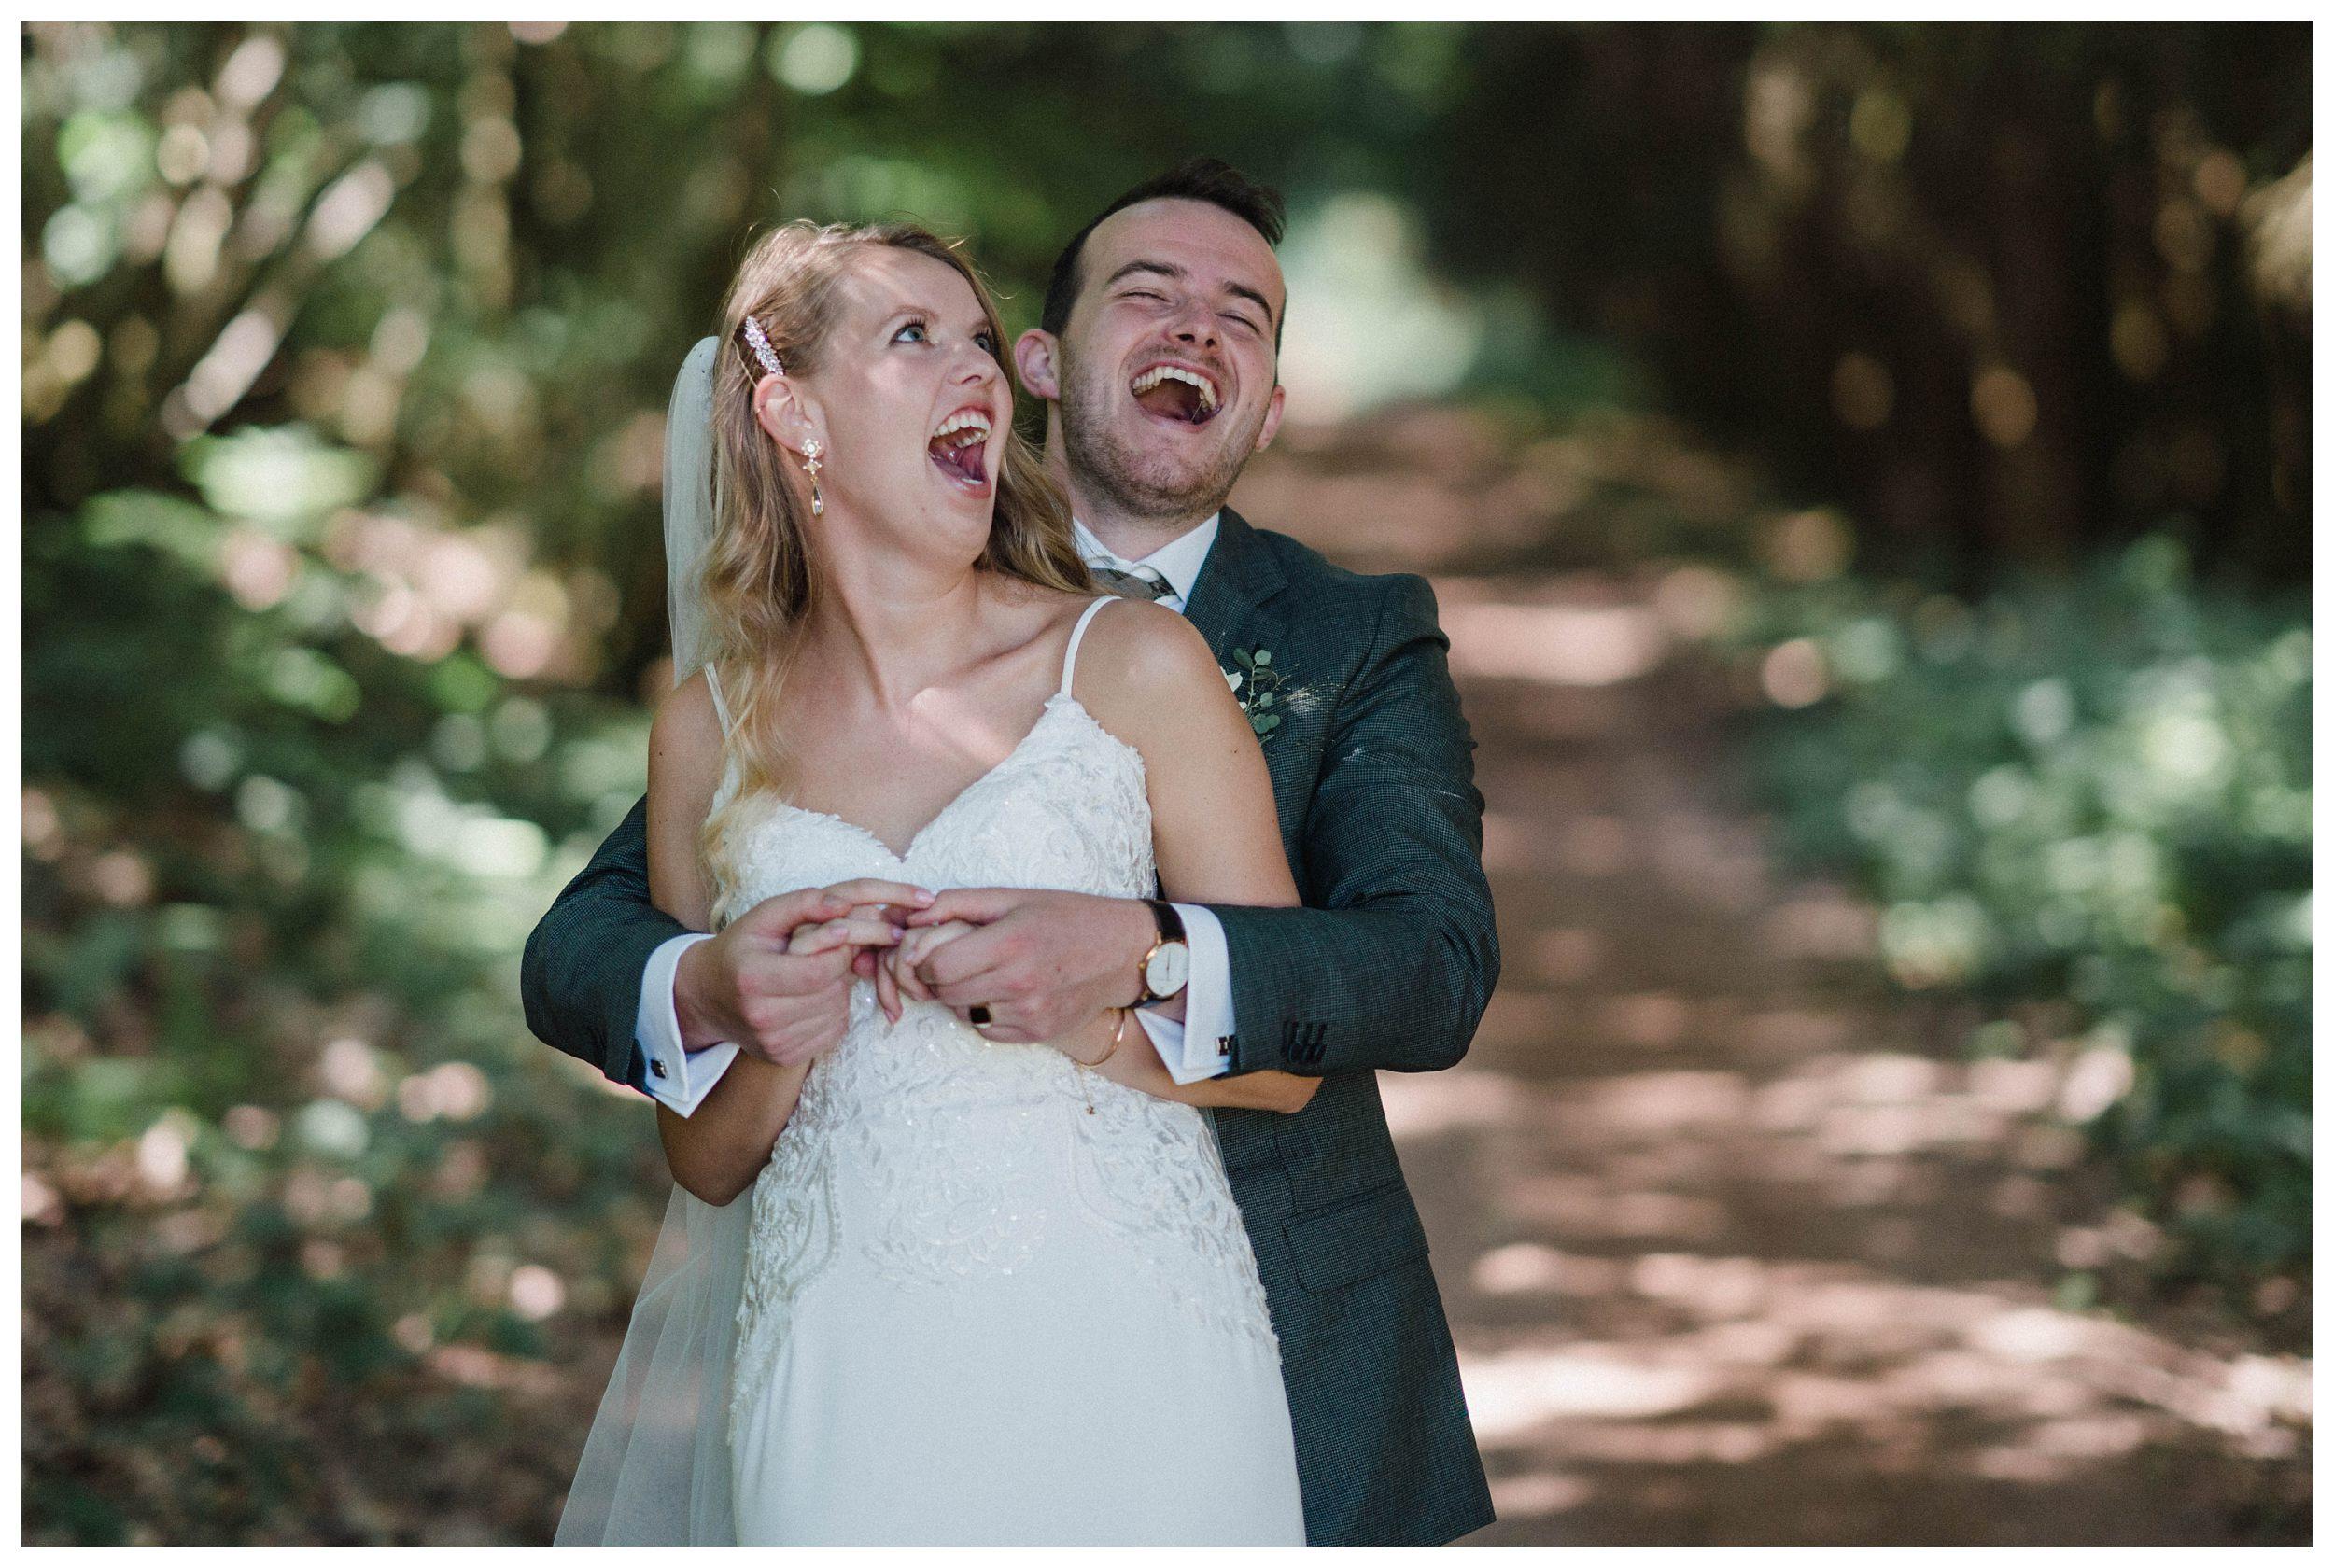 huwelijksfotograaf bruidsfotograaf destinationwedding huwelijksfotografie in ardennen nederland (47).jpg